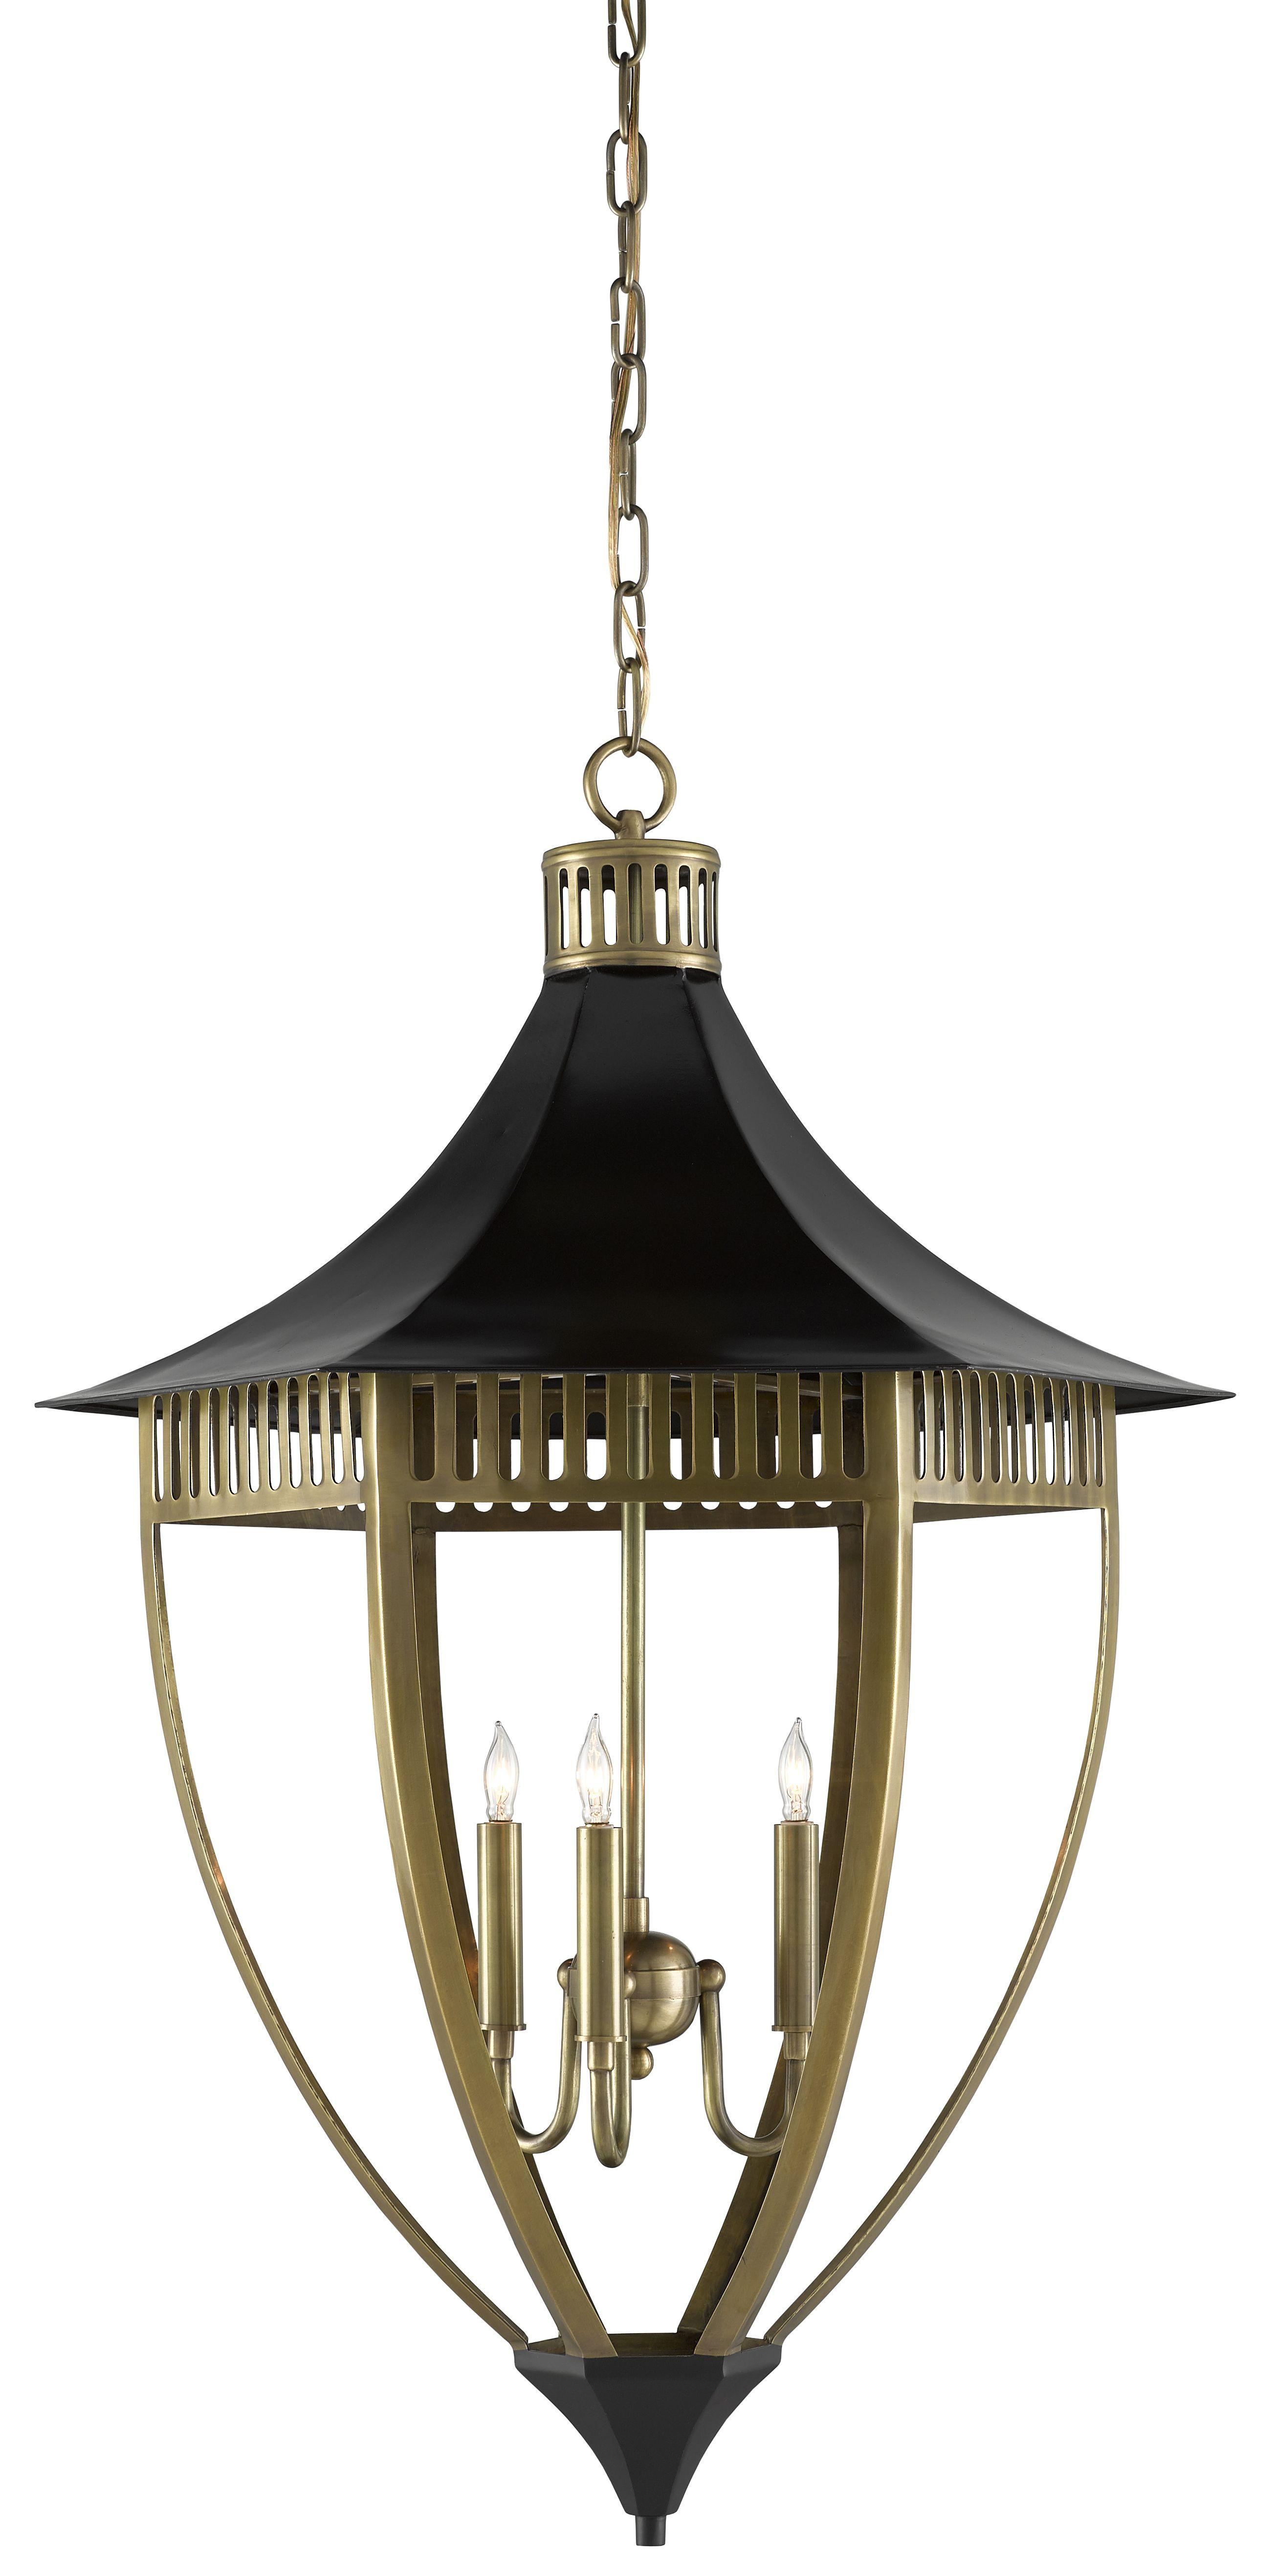 Blythe Lantern Currey And Company Lantern Lights Chandelier Lighting Fixtures Chandelier